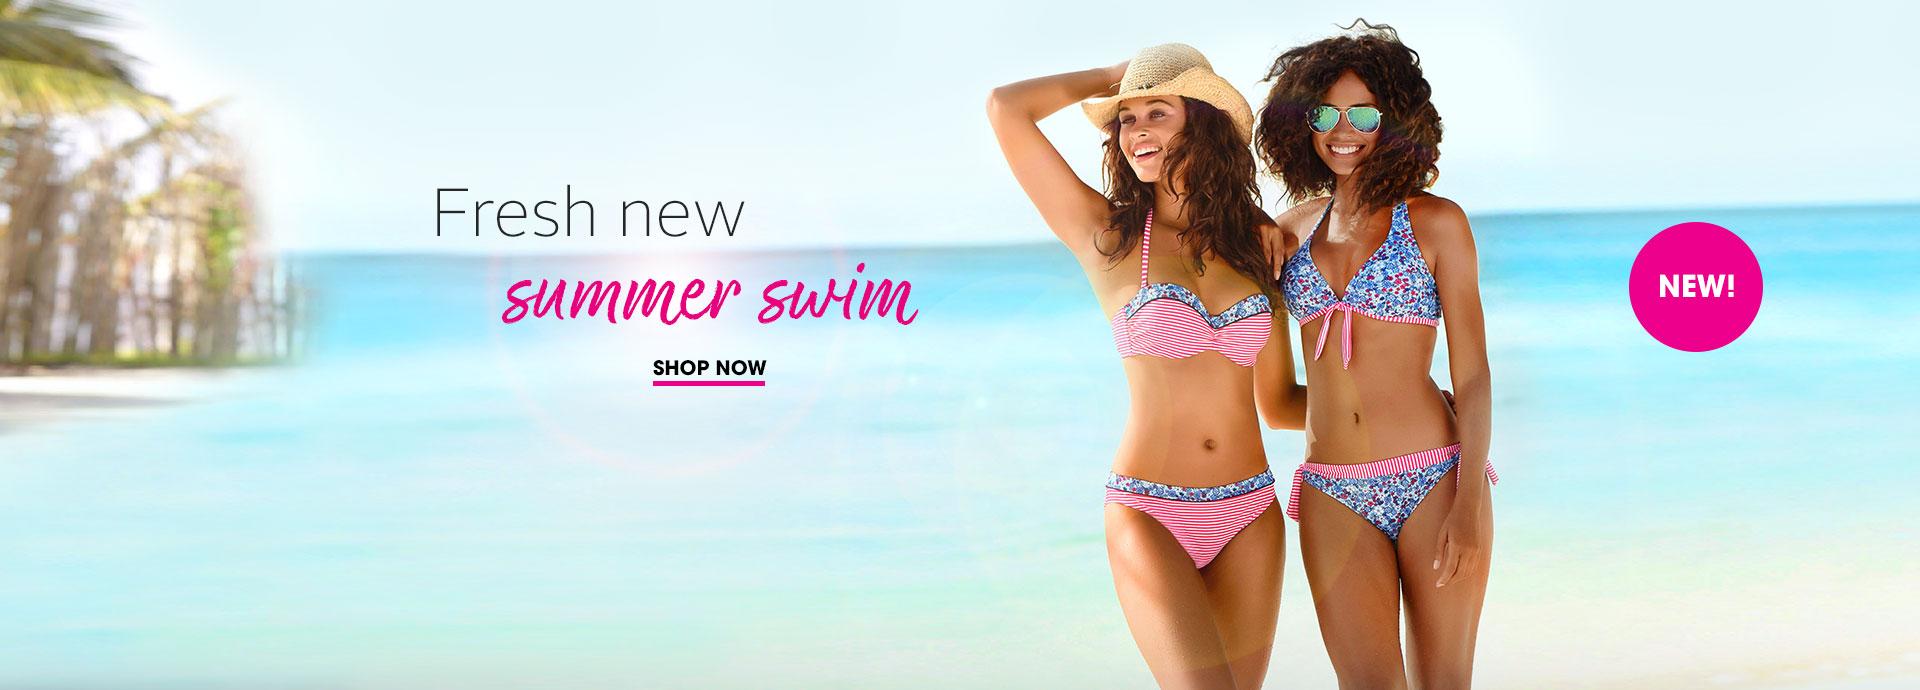 919108cf69 LASCANA Swimwear, Beach Clothing & Sexy Lingerie for Women